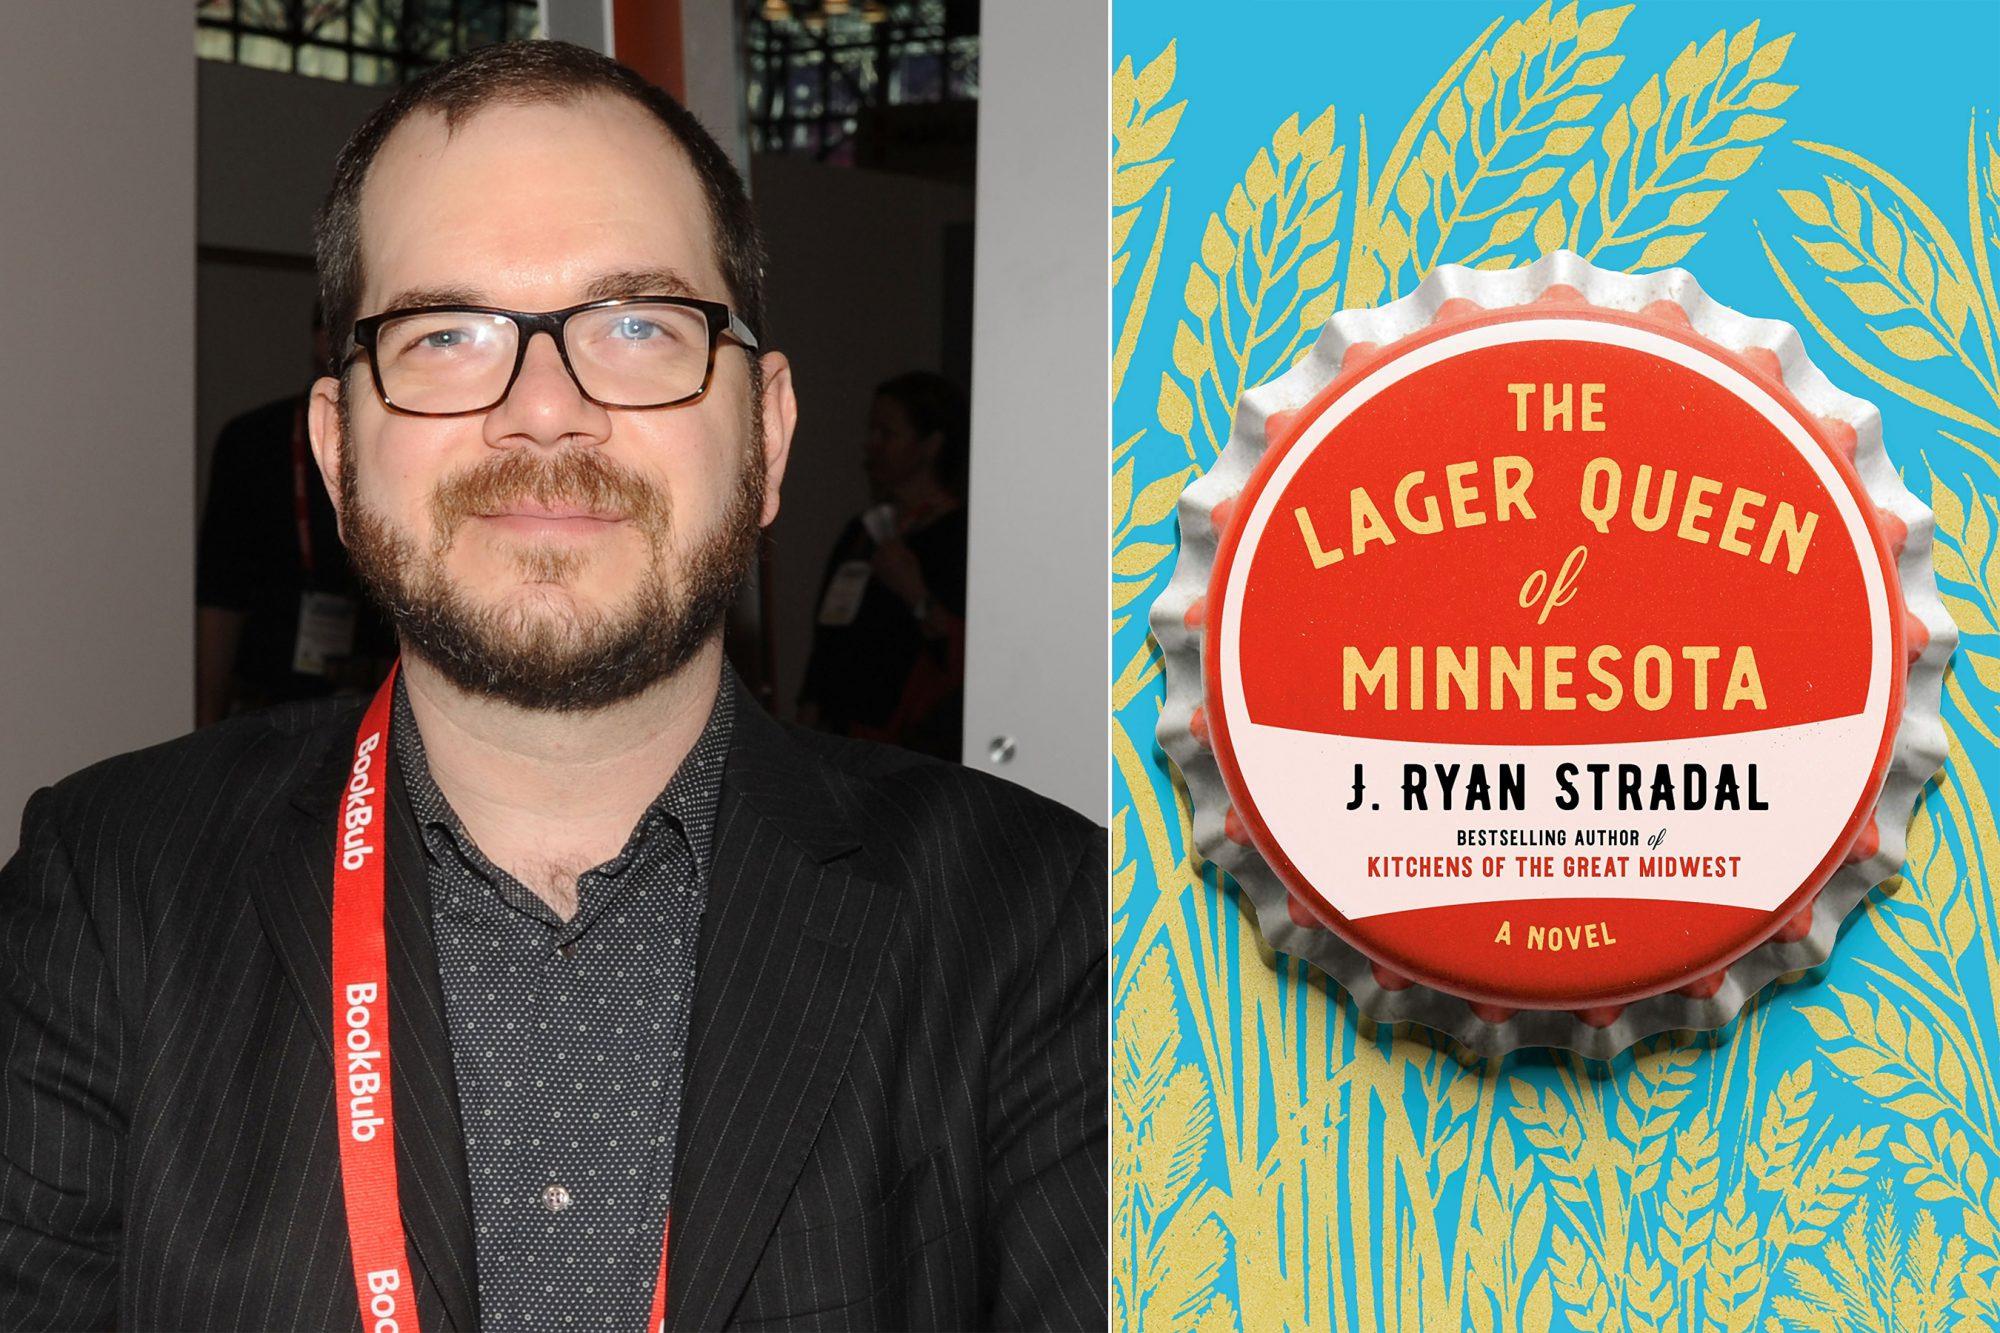 J. Ryan Stradal